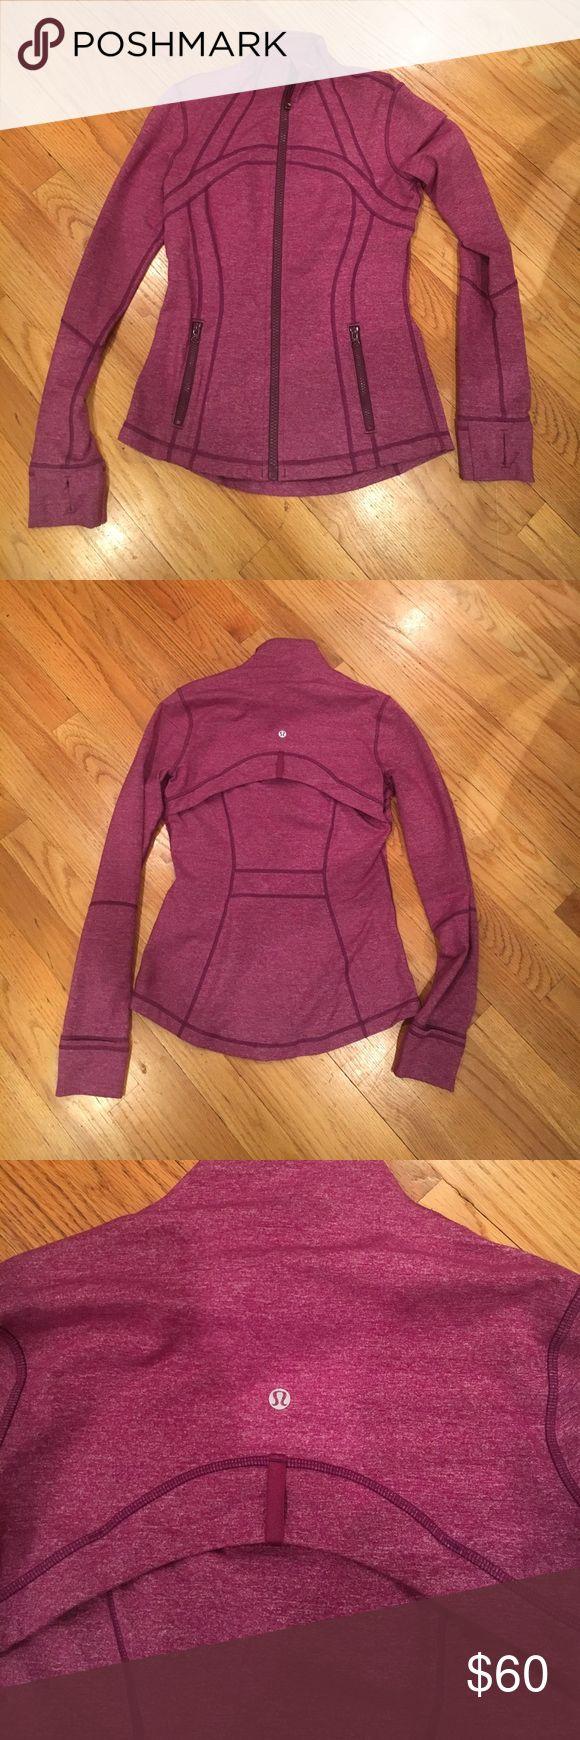 Lululemon zip up jacket Lululemon great condition purple zip up jacket. lululemon athletica Jackets & Coats